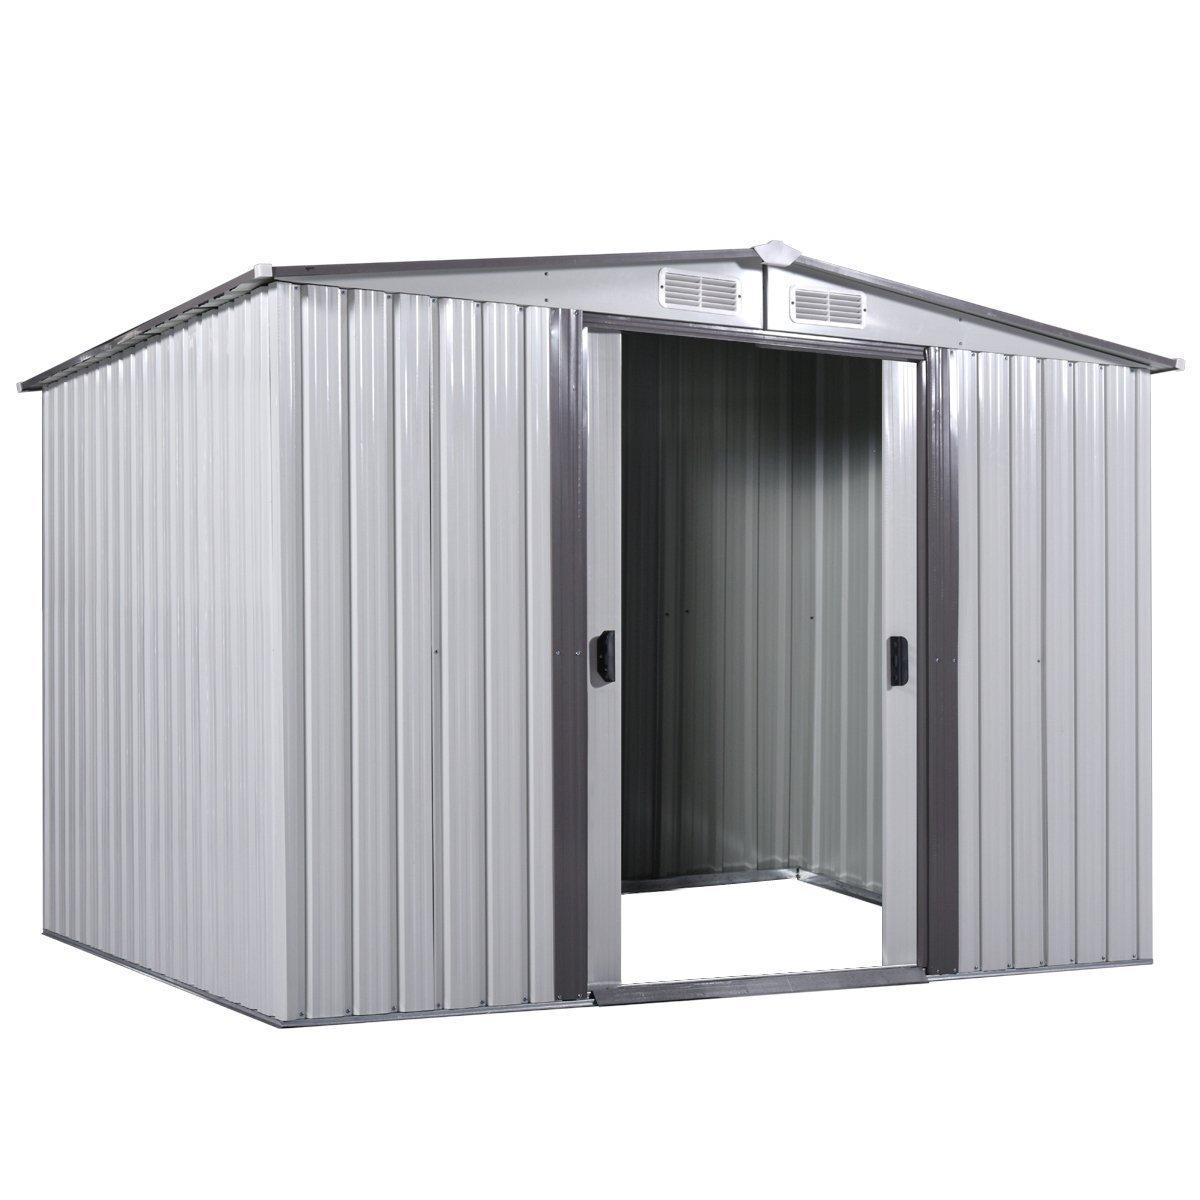 LAZYMOON 6' x 8' Outdoor Steel Garden Utility Tool Shed Storage Backyard Lawn Building Garage Sliding Door (6' x 8')